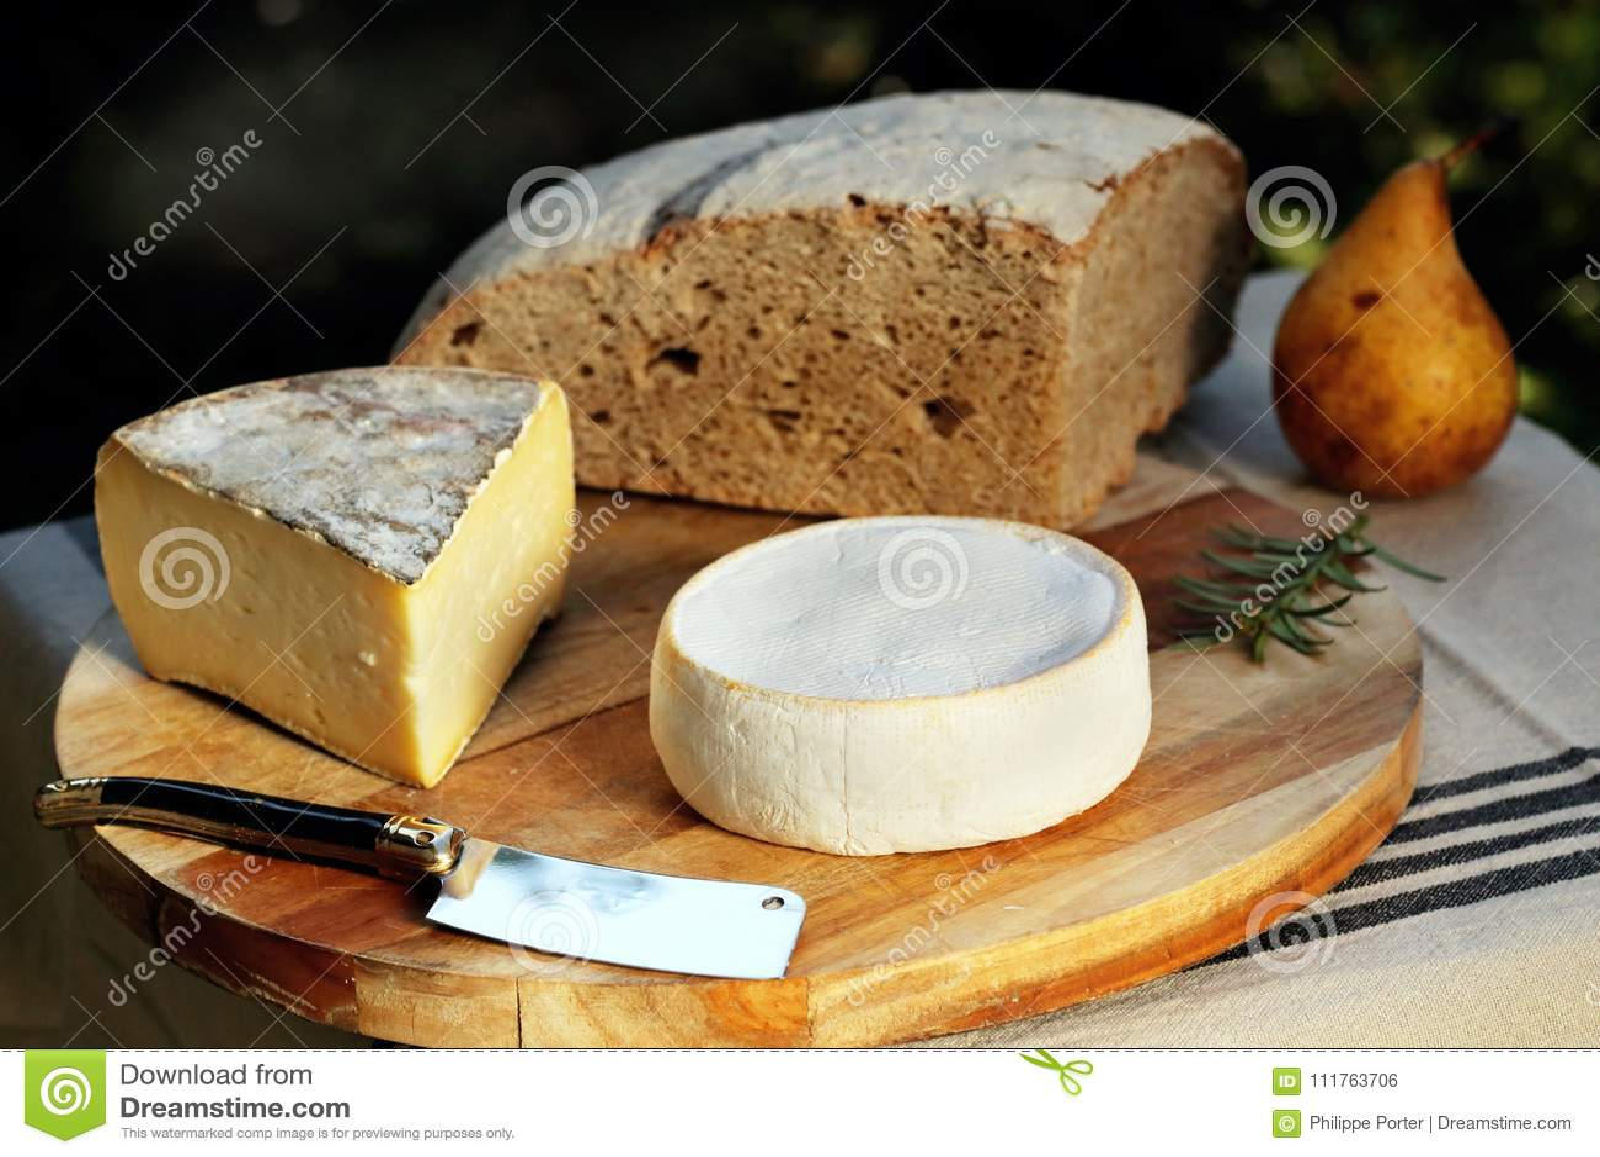 reblochon tomme de savoie french cheese savoy french alps france rh dreamstime com